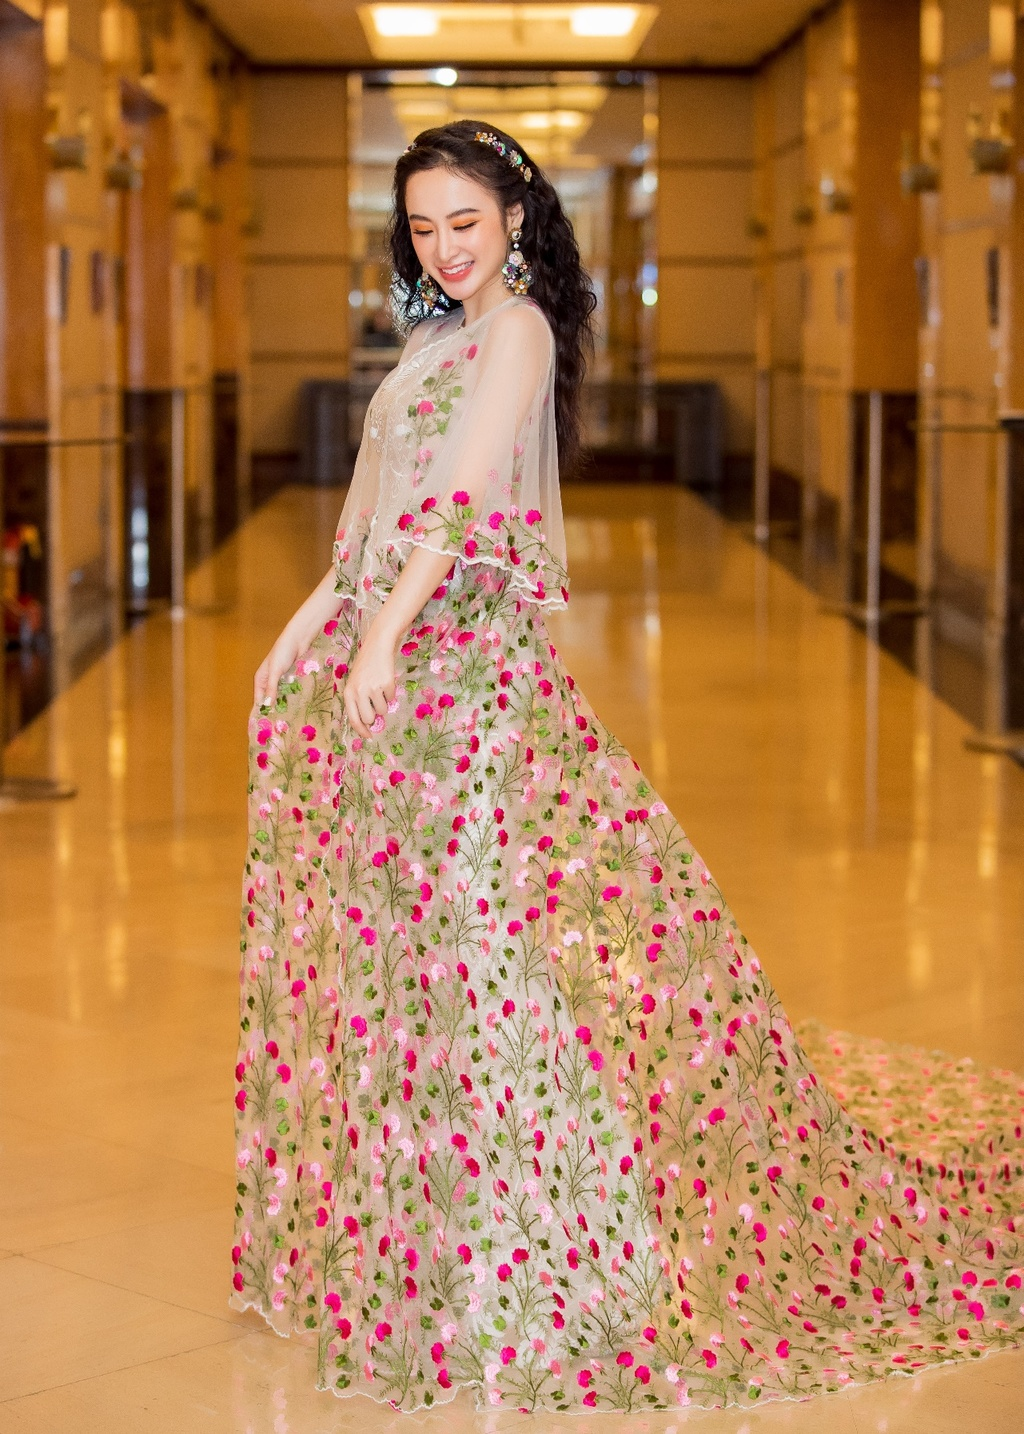 Angela Phuong Trinh hoa cong chua vay hoa, Sam quyen ru trong su kien hinh anh 2